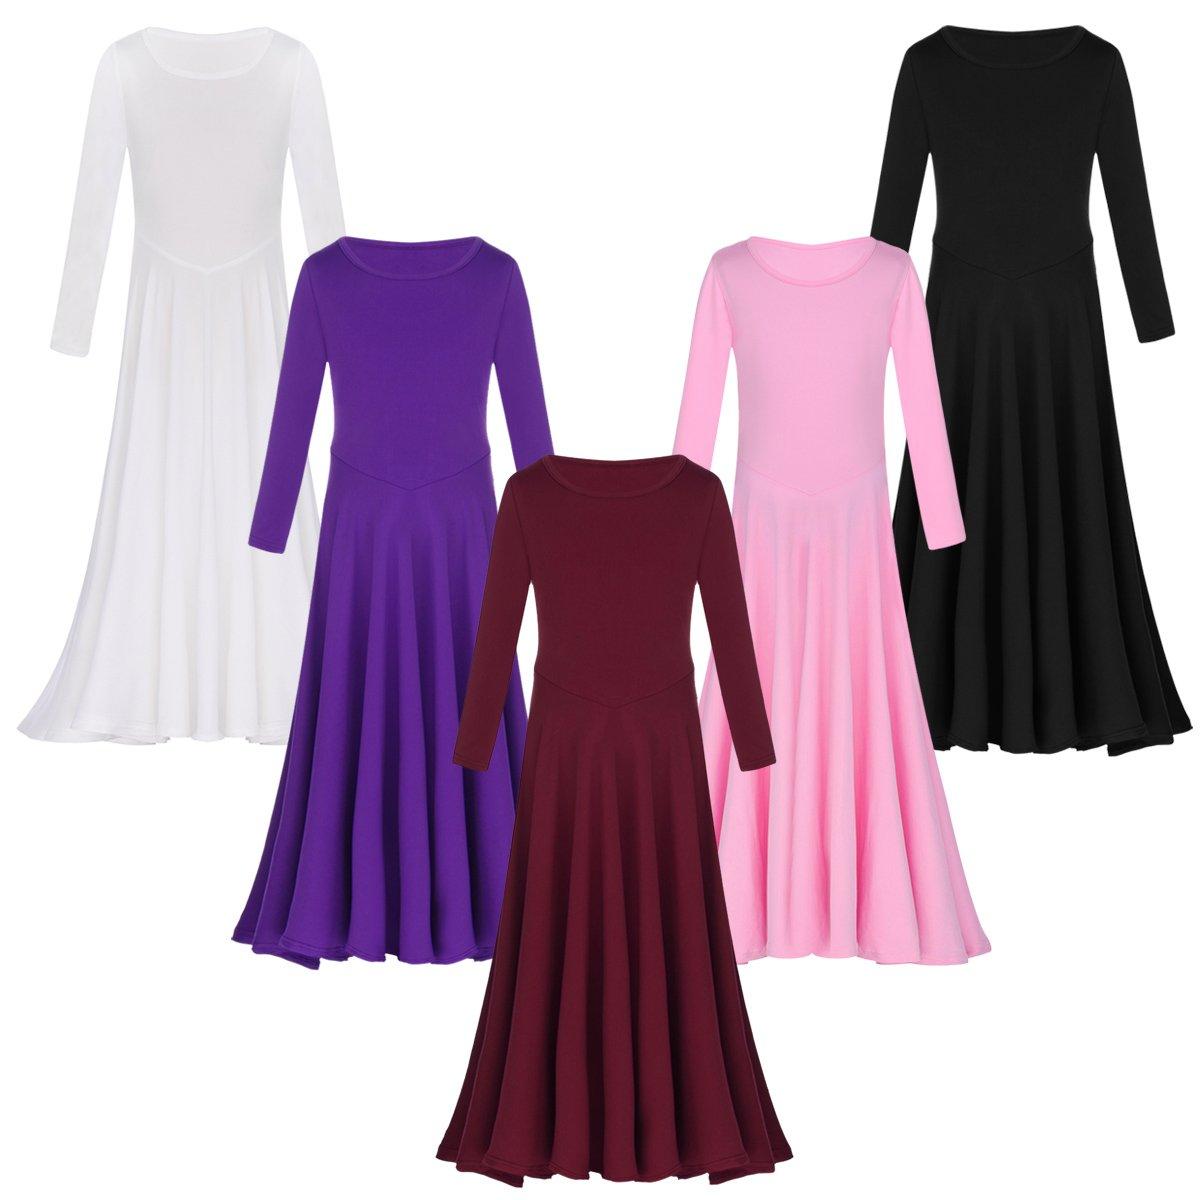 f0e9e0952a6 Kids Girls Liturgical Praise Dress Loose Fit Full Length Long Sleeve Dance  Dress Dancewear Worship Costume